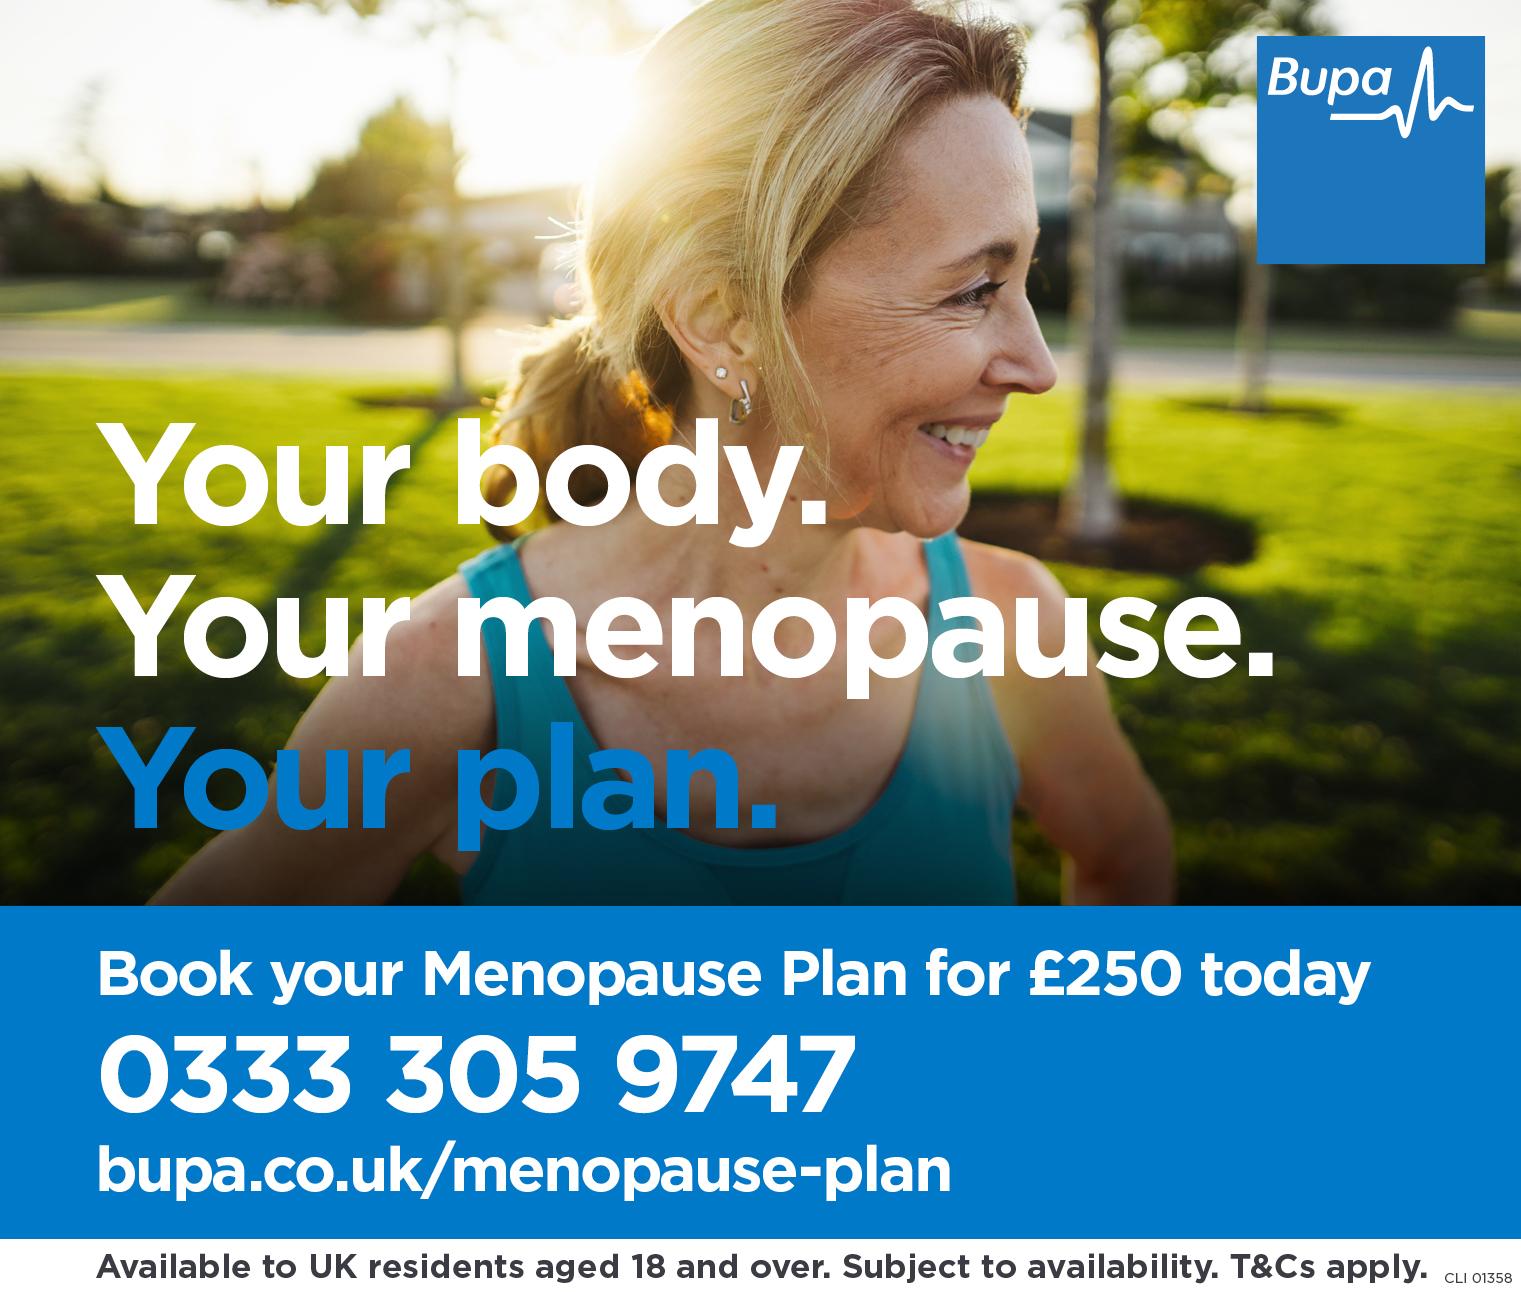 Bupa Menopause Plan